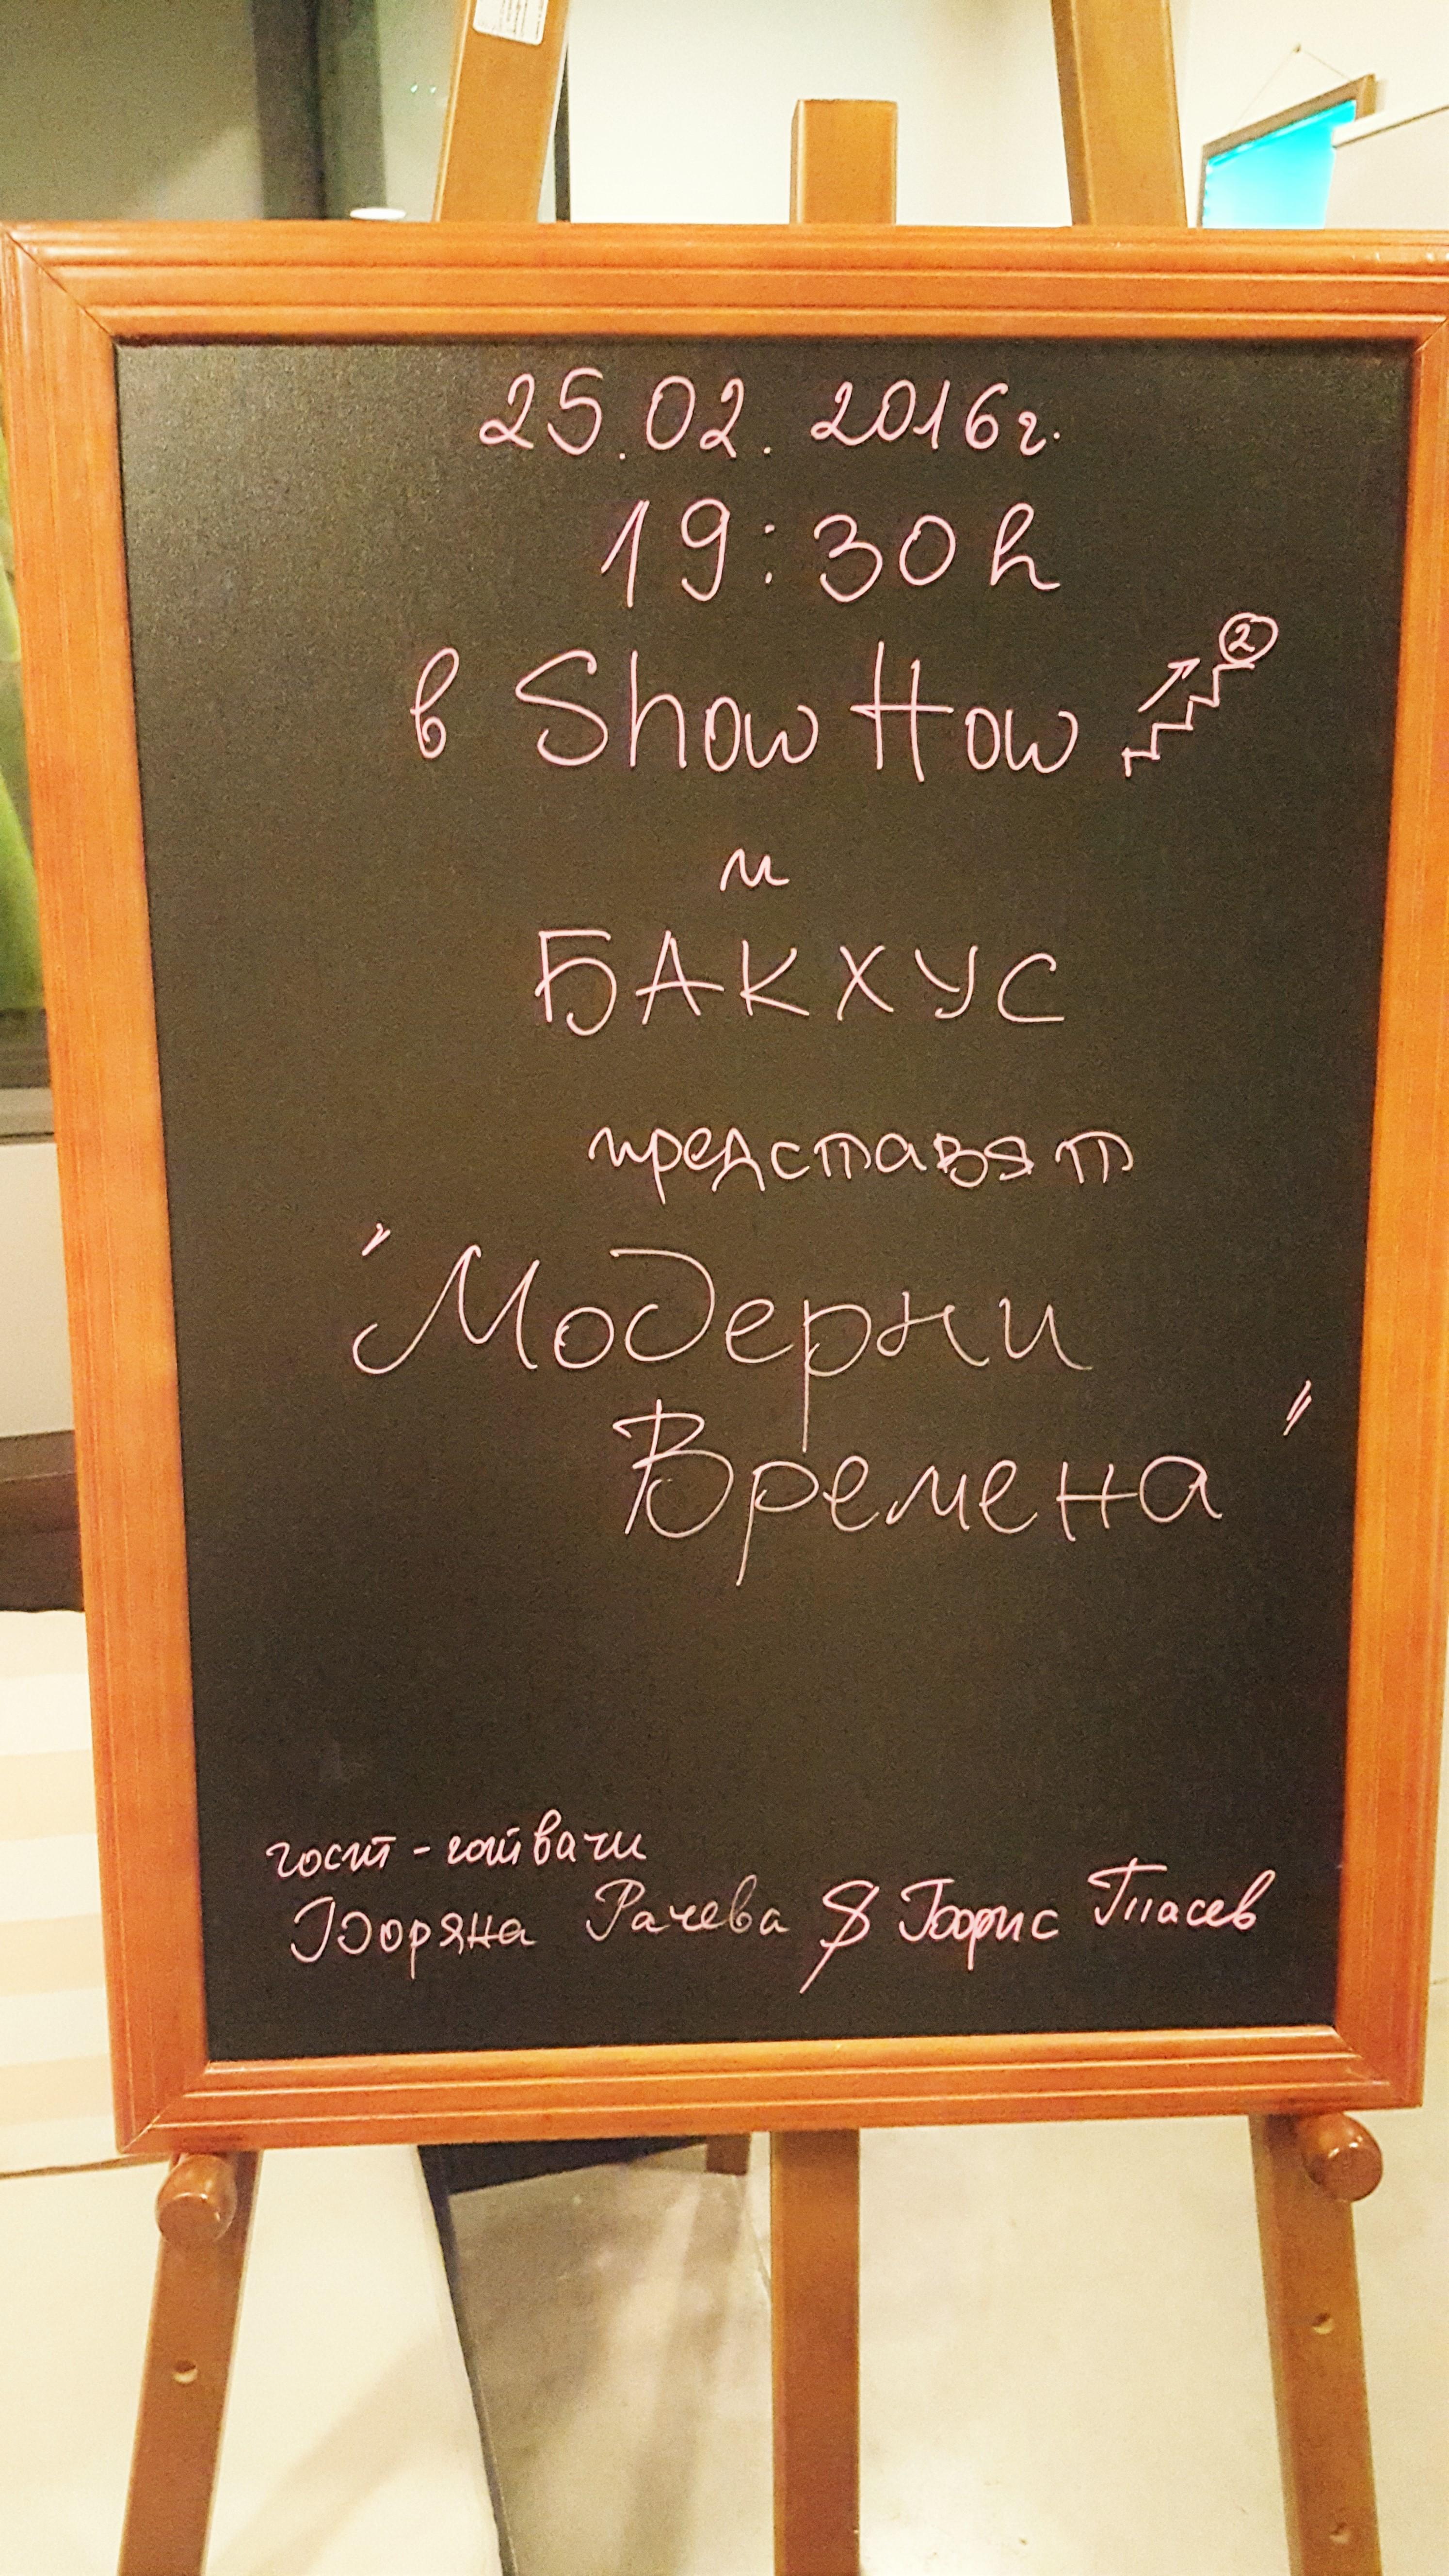 Вечеря Модерни веремна в ШоуХау/ Moderni vremena dinner at ShowHow by placescases.com